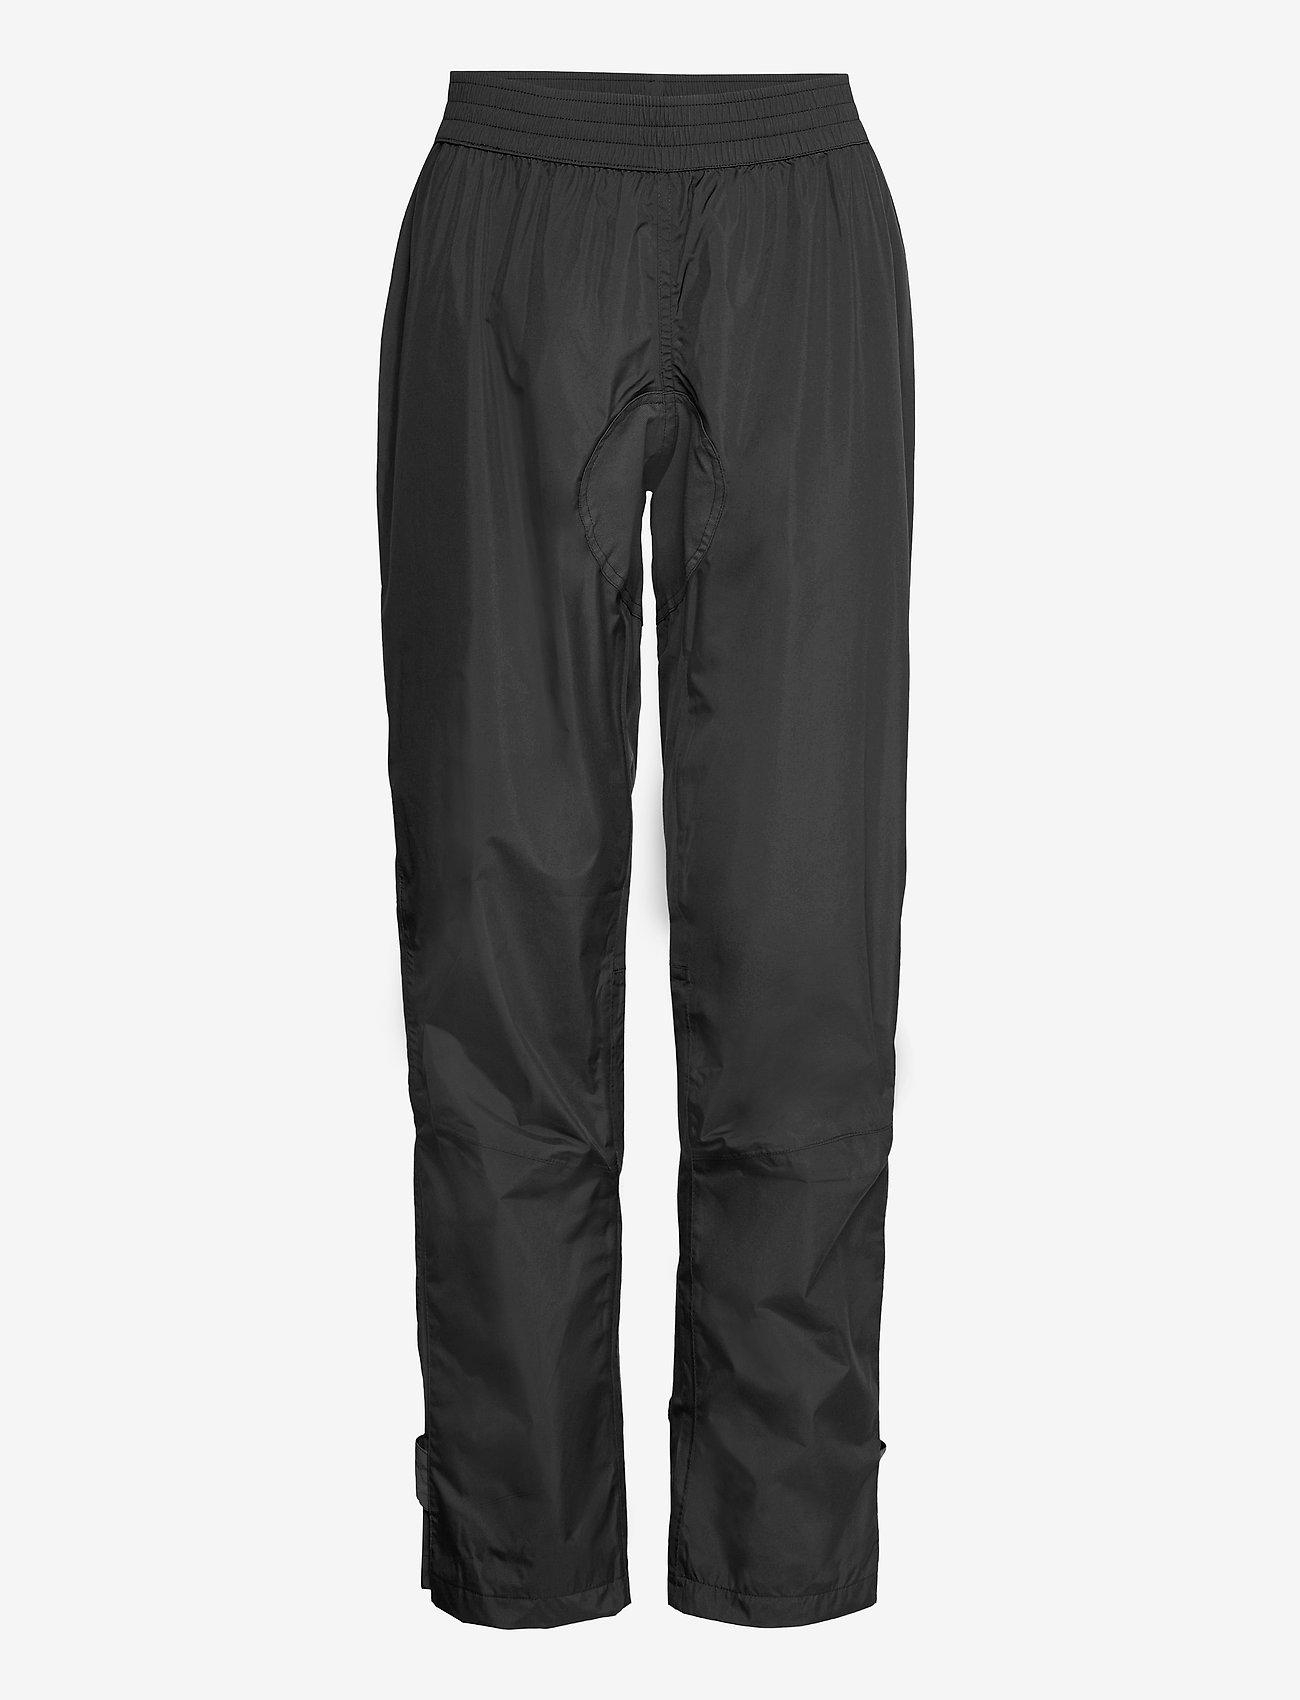 Craft - Core Endur Hydro Pants W - cycling shorts & tights - black - 0